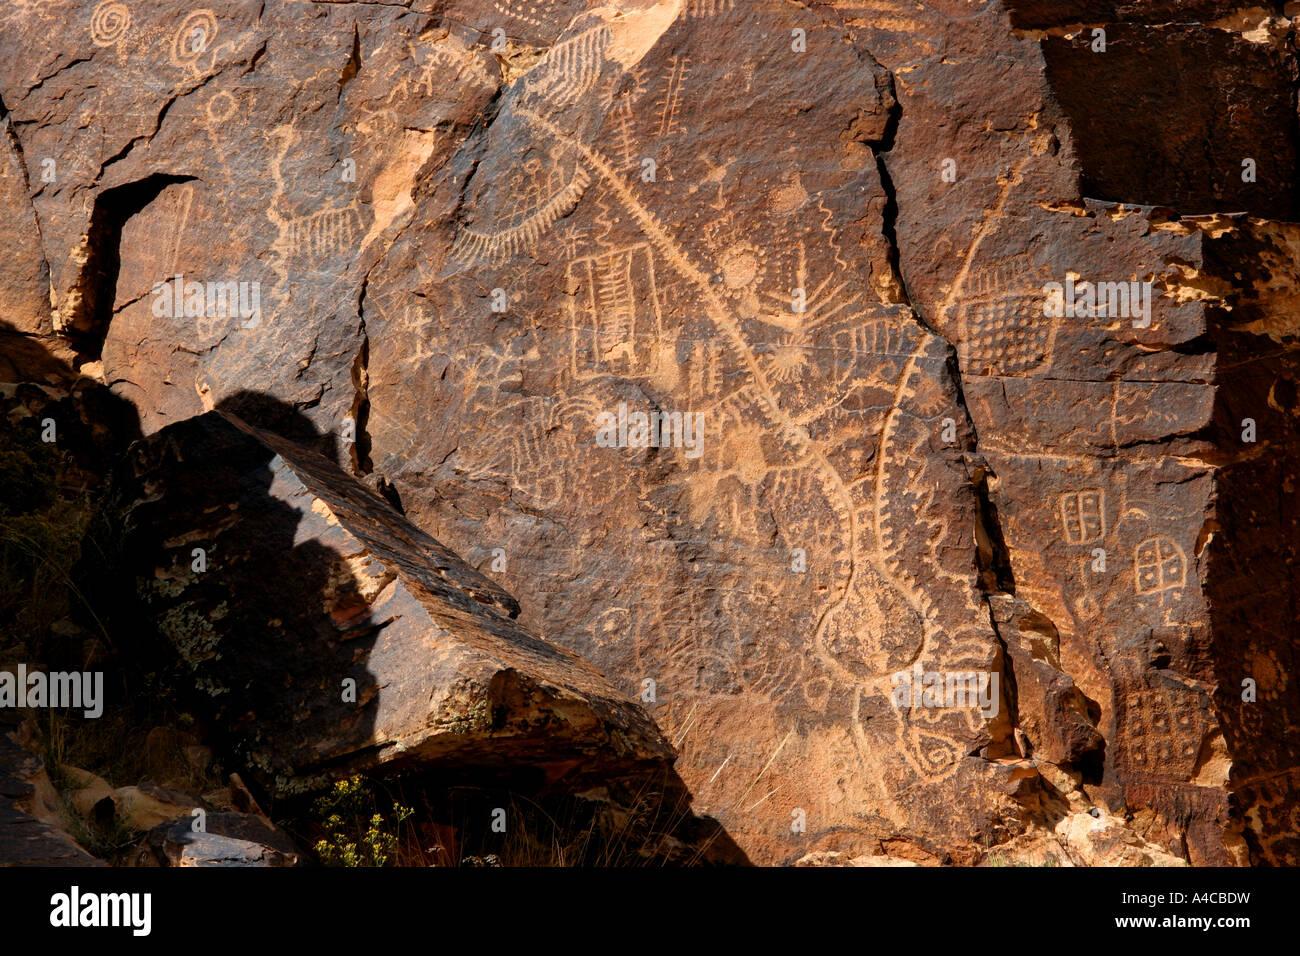 Parowan Lücke Petroglyphen, utah Stockfoto